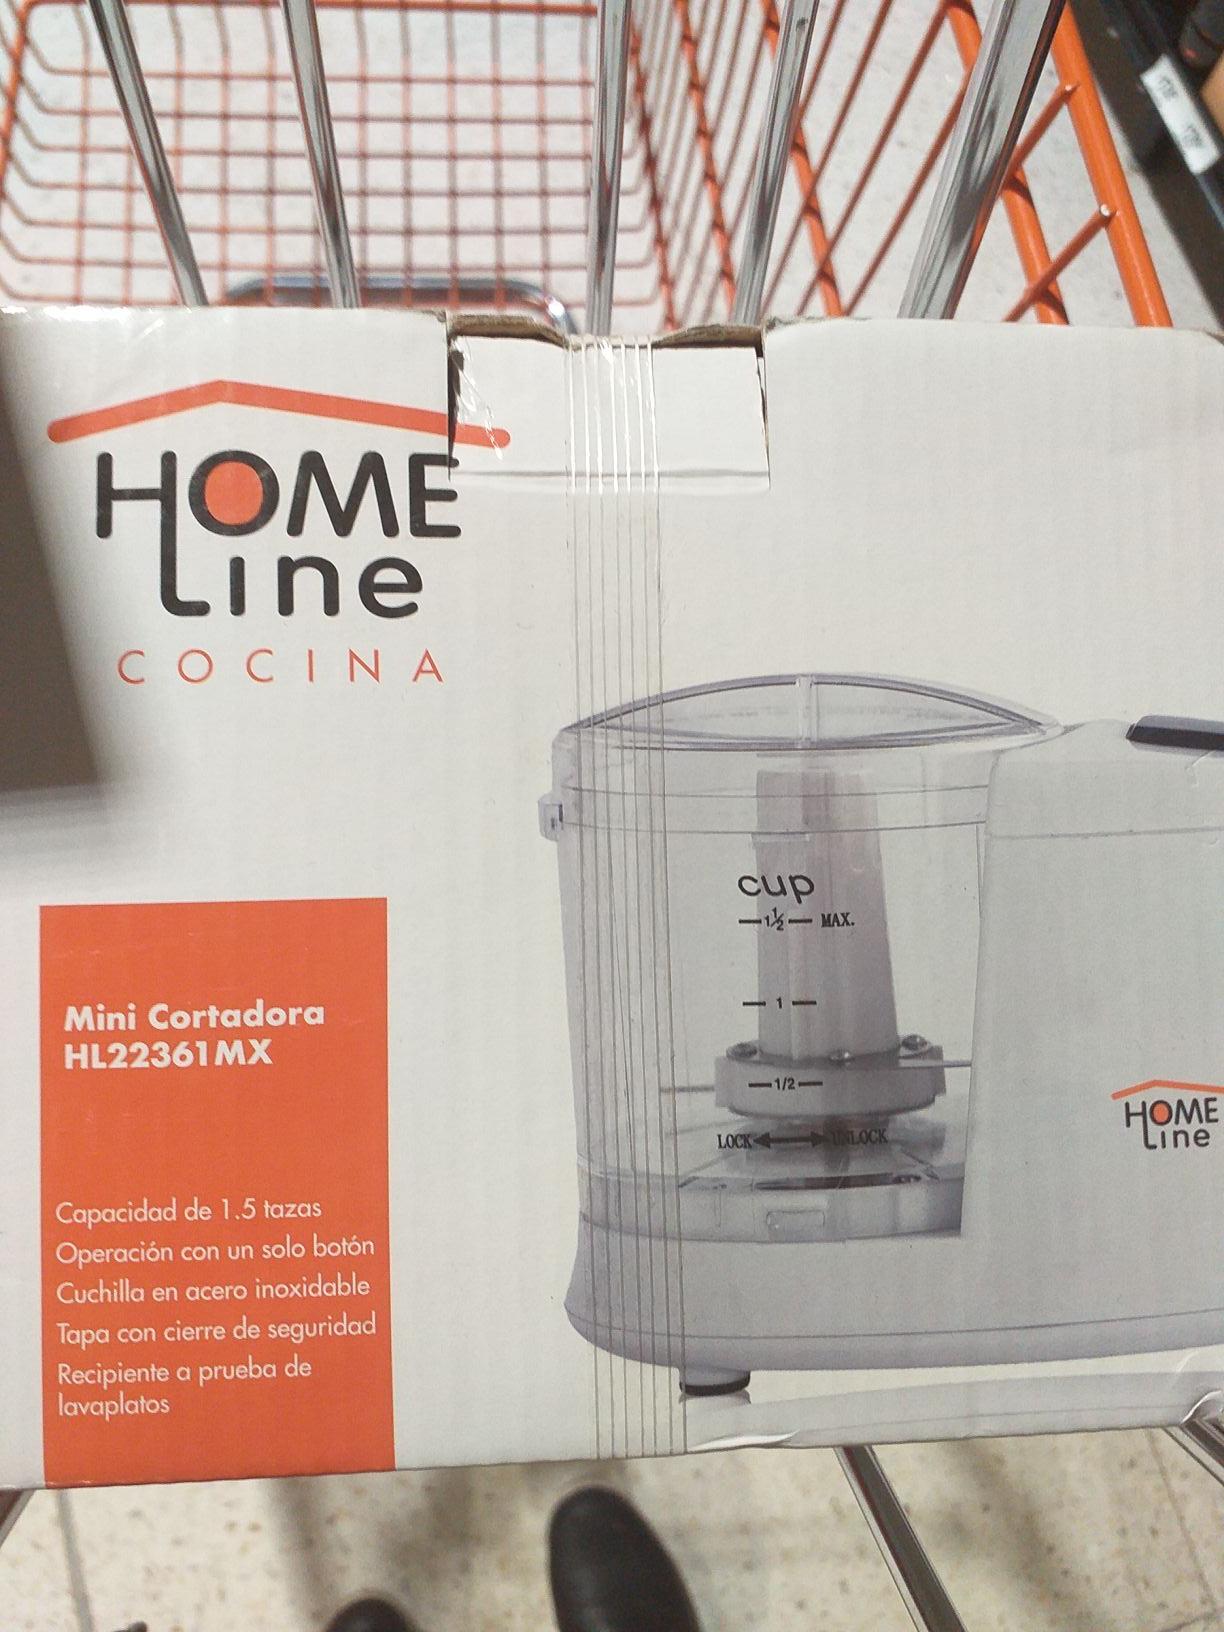 Chedraui: Trituradora de alimentos  marca Home Line